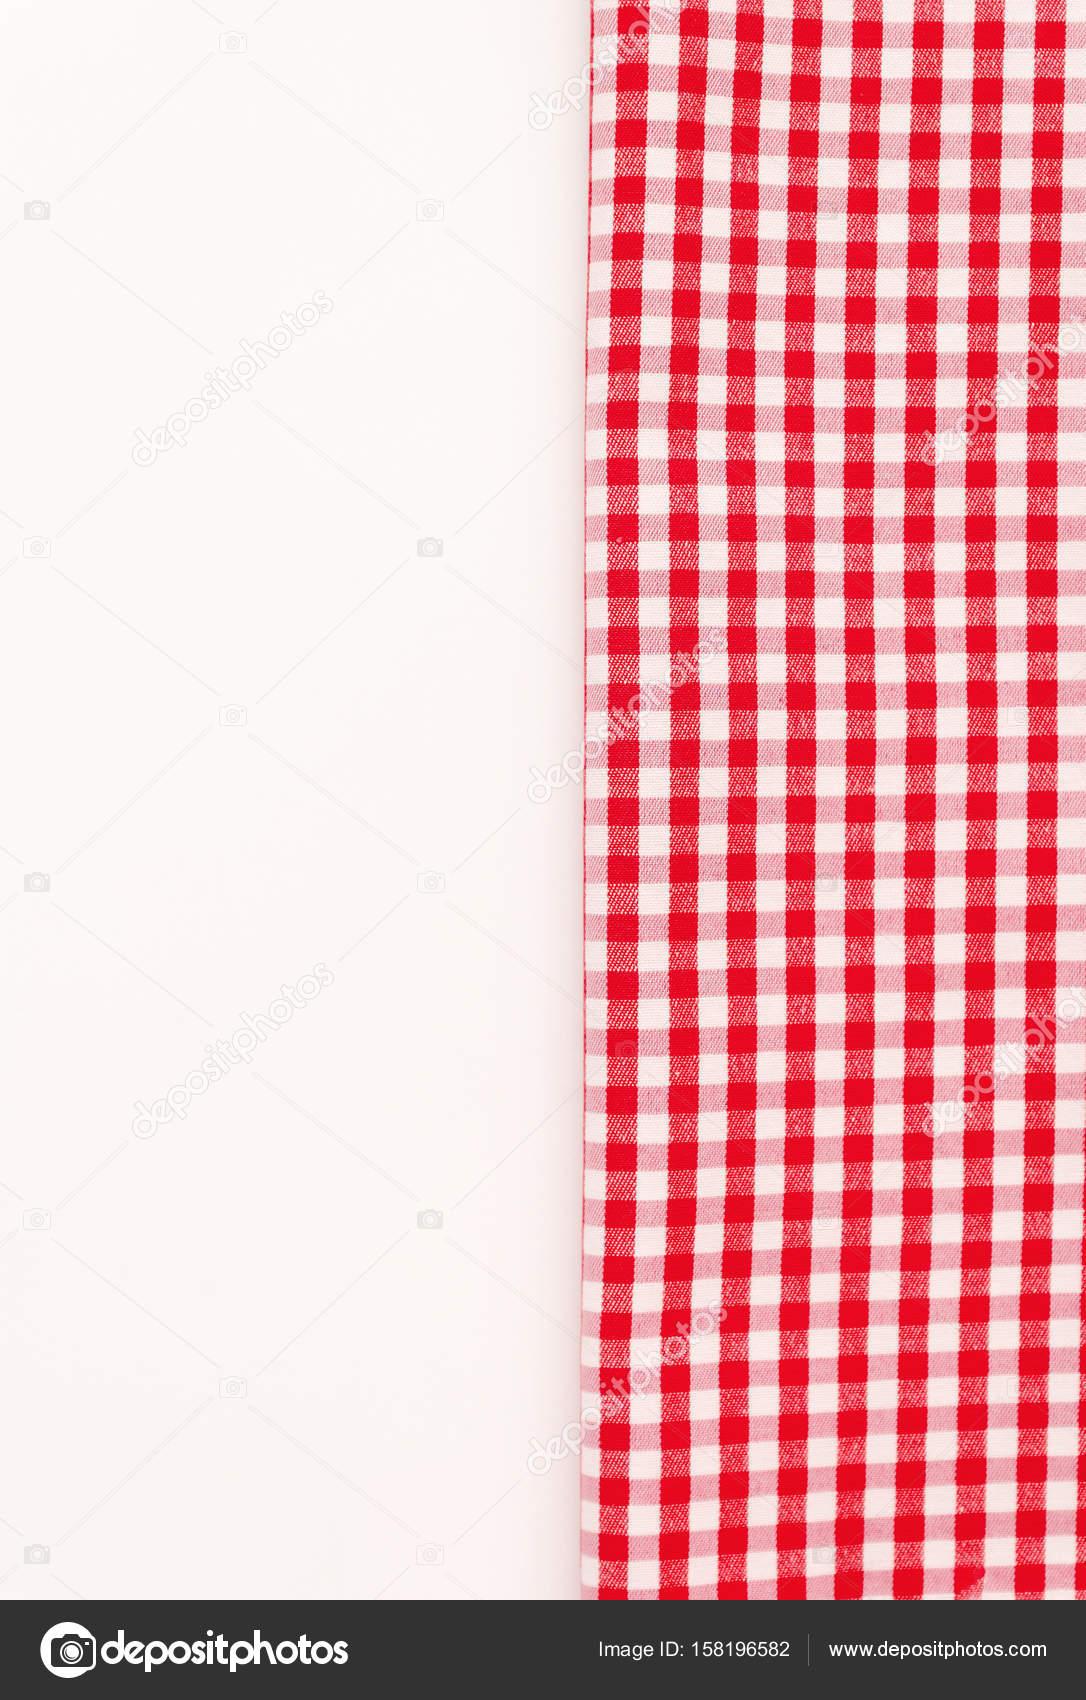 Paño rojo, un paño de cocina con un patrón a cuadros, en un blanco ...